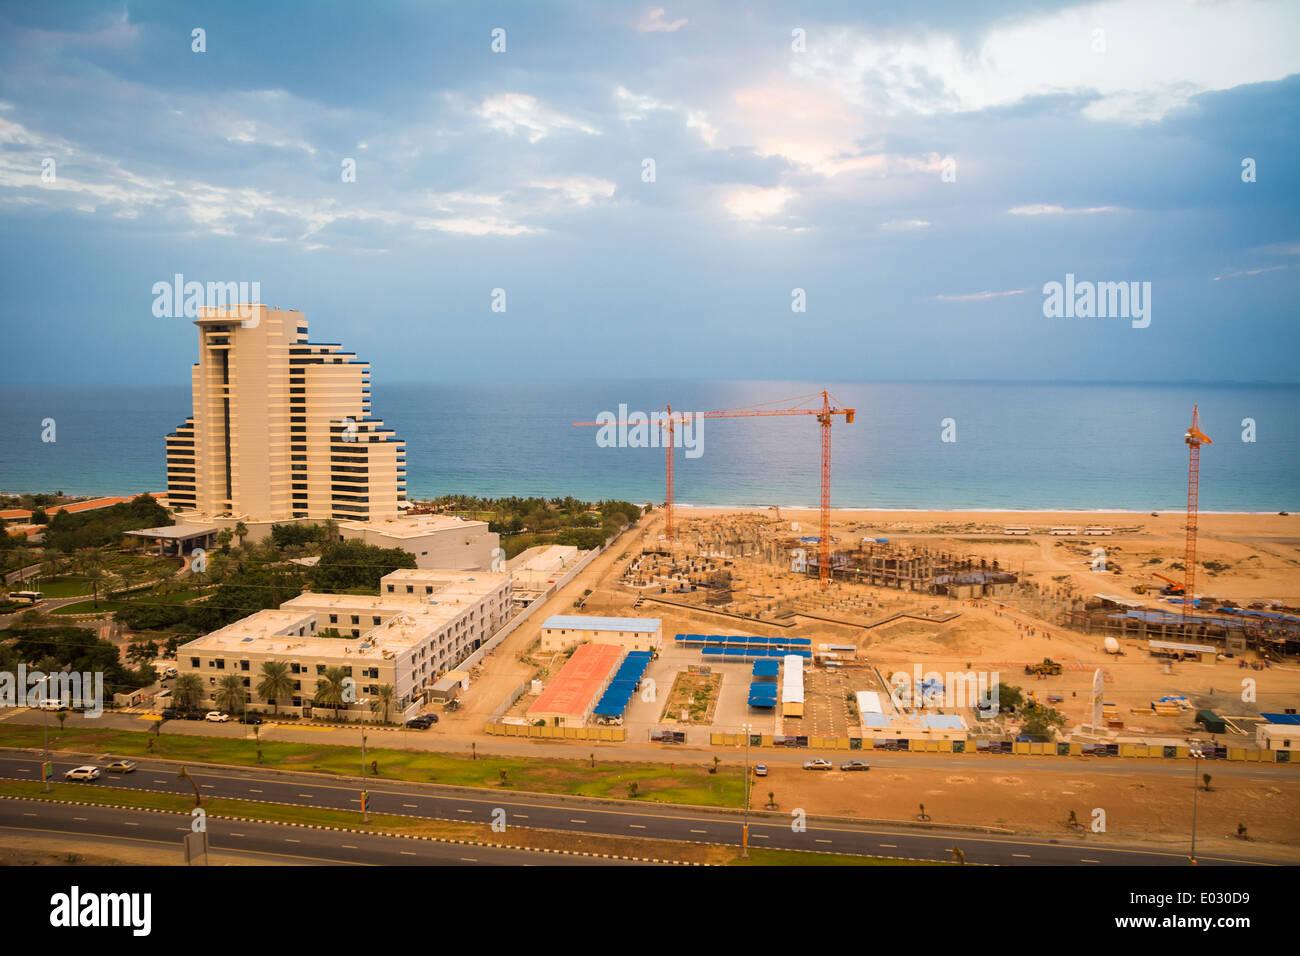 Le Meridien Hotel Al Aqah Beach Resort And Construction Of A New